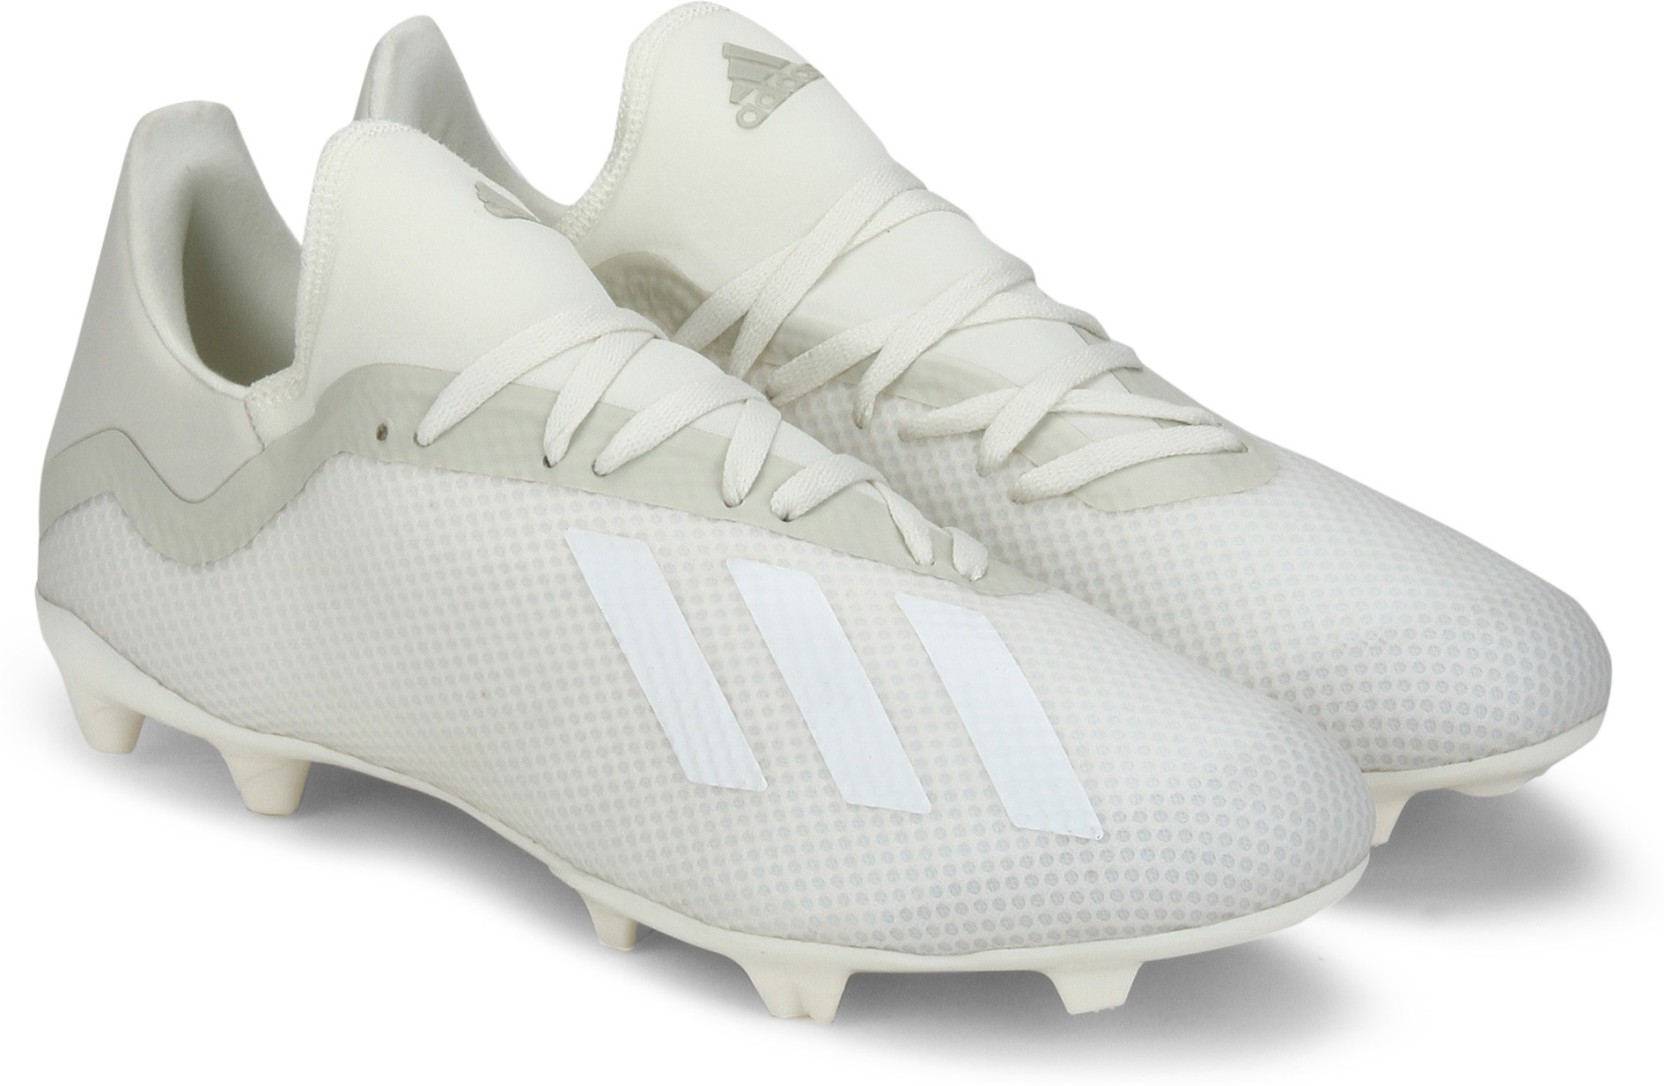 e81caf8cfb9 ADIDAS X 18.3 FG Football Shoes For Men - Buy ADIDAS X 18.3 FG ...